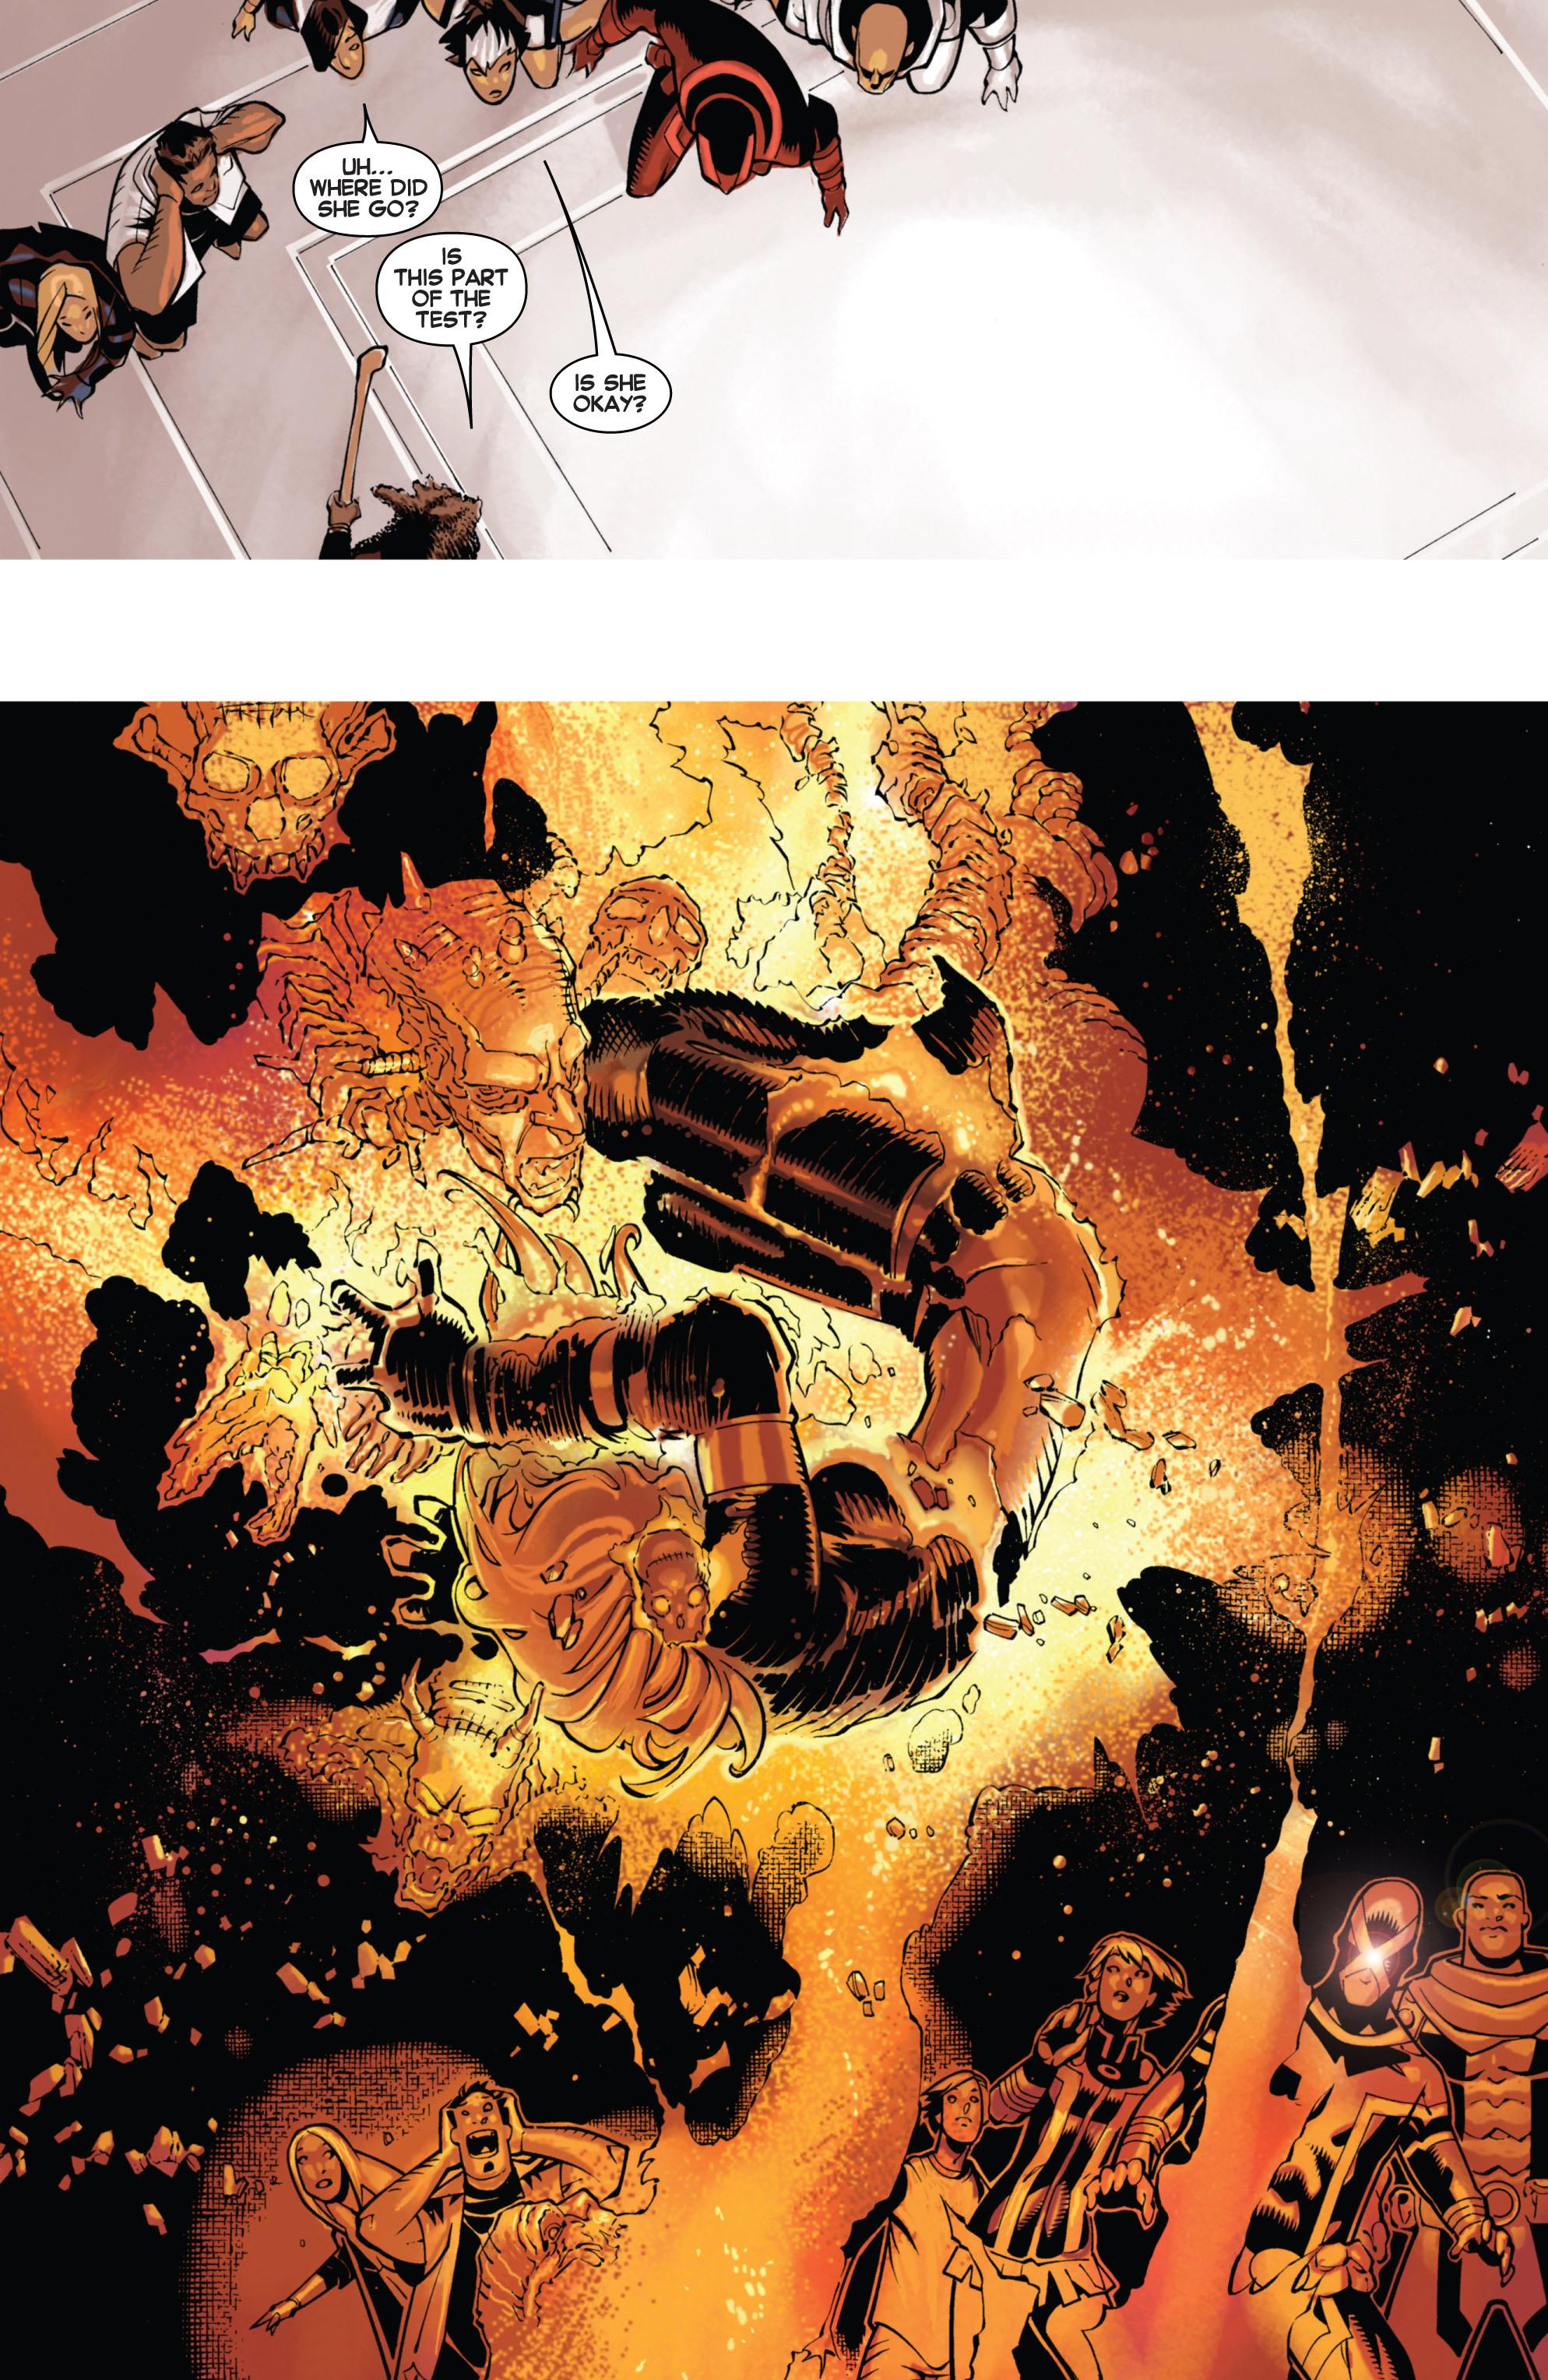 Read online Uncanny X-Men (2013) comic -  Issue # _TPB 1 - Revolution - 80